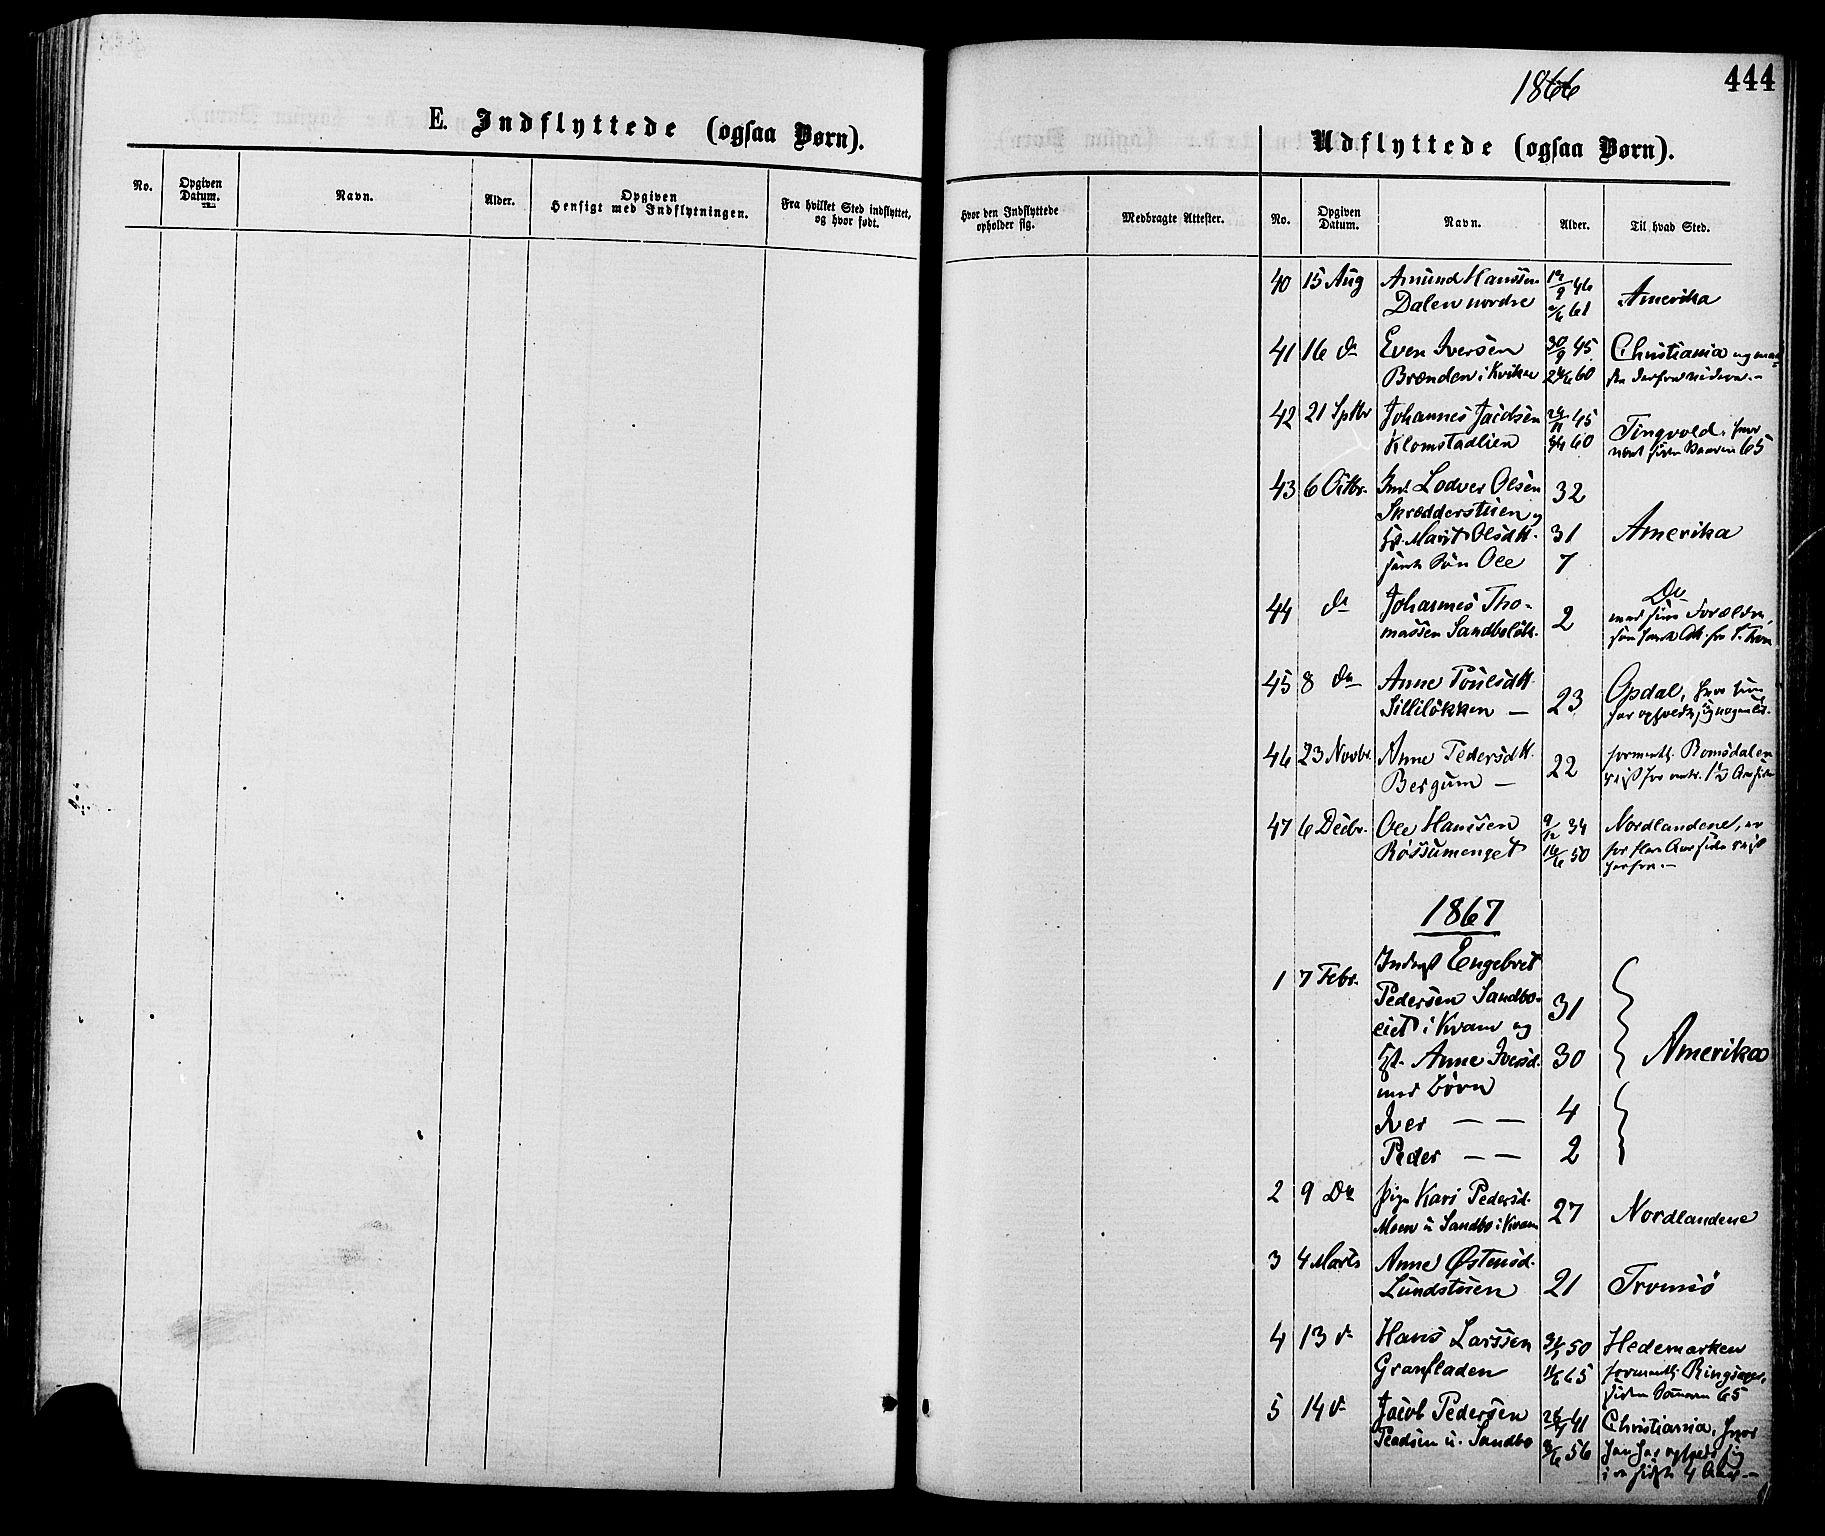 SAH, Nord-Fron prestekontor, Ministerialbok nr. 2, 1865-1883, s. 444